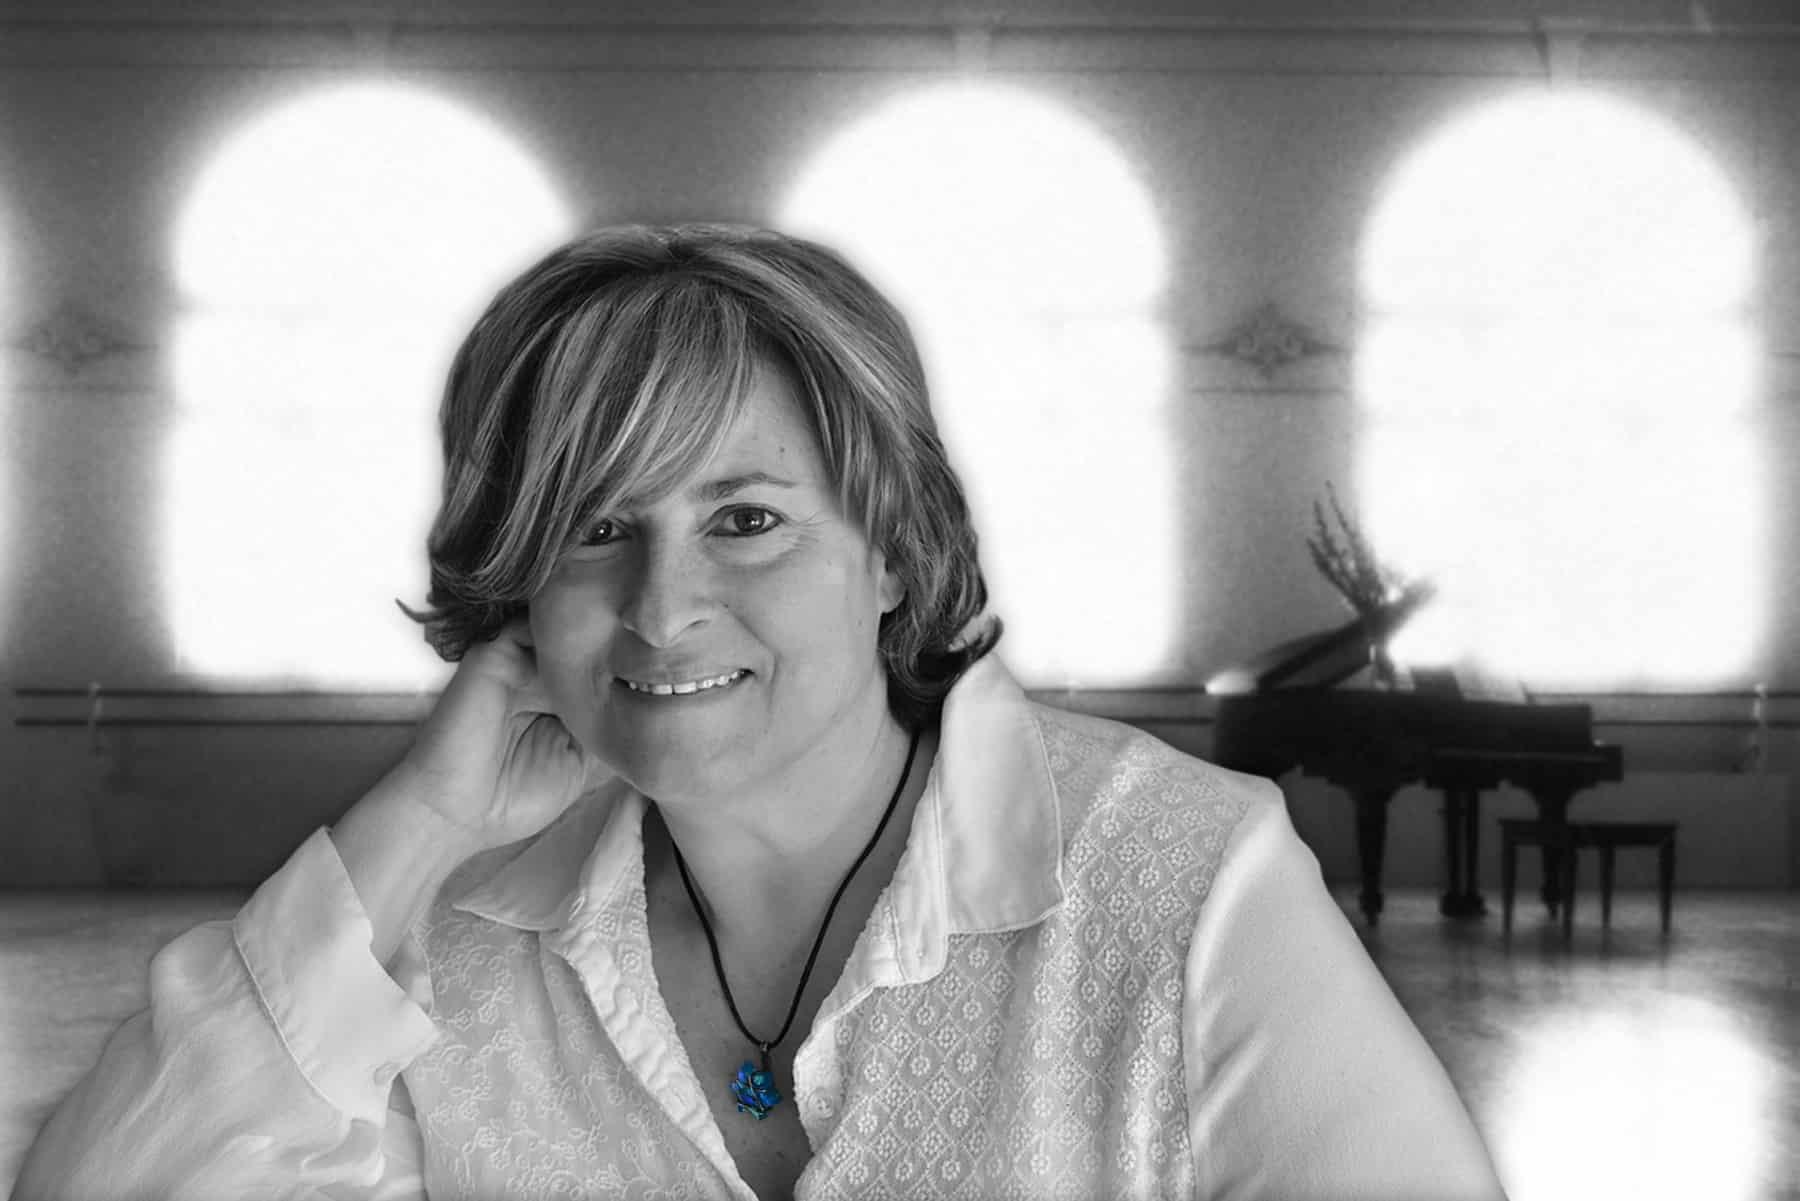 Jewish gospel musician Beth Styles